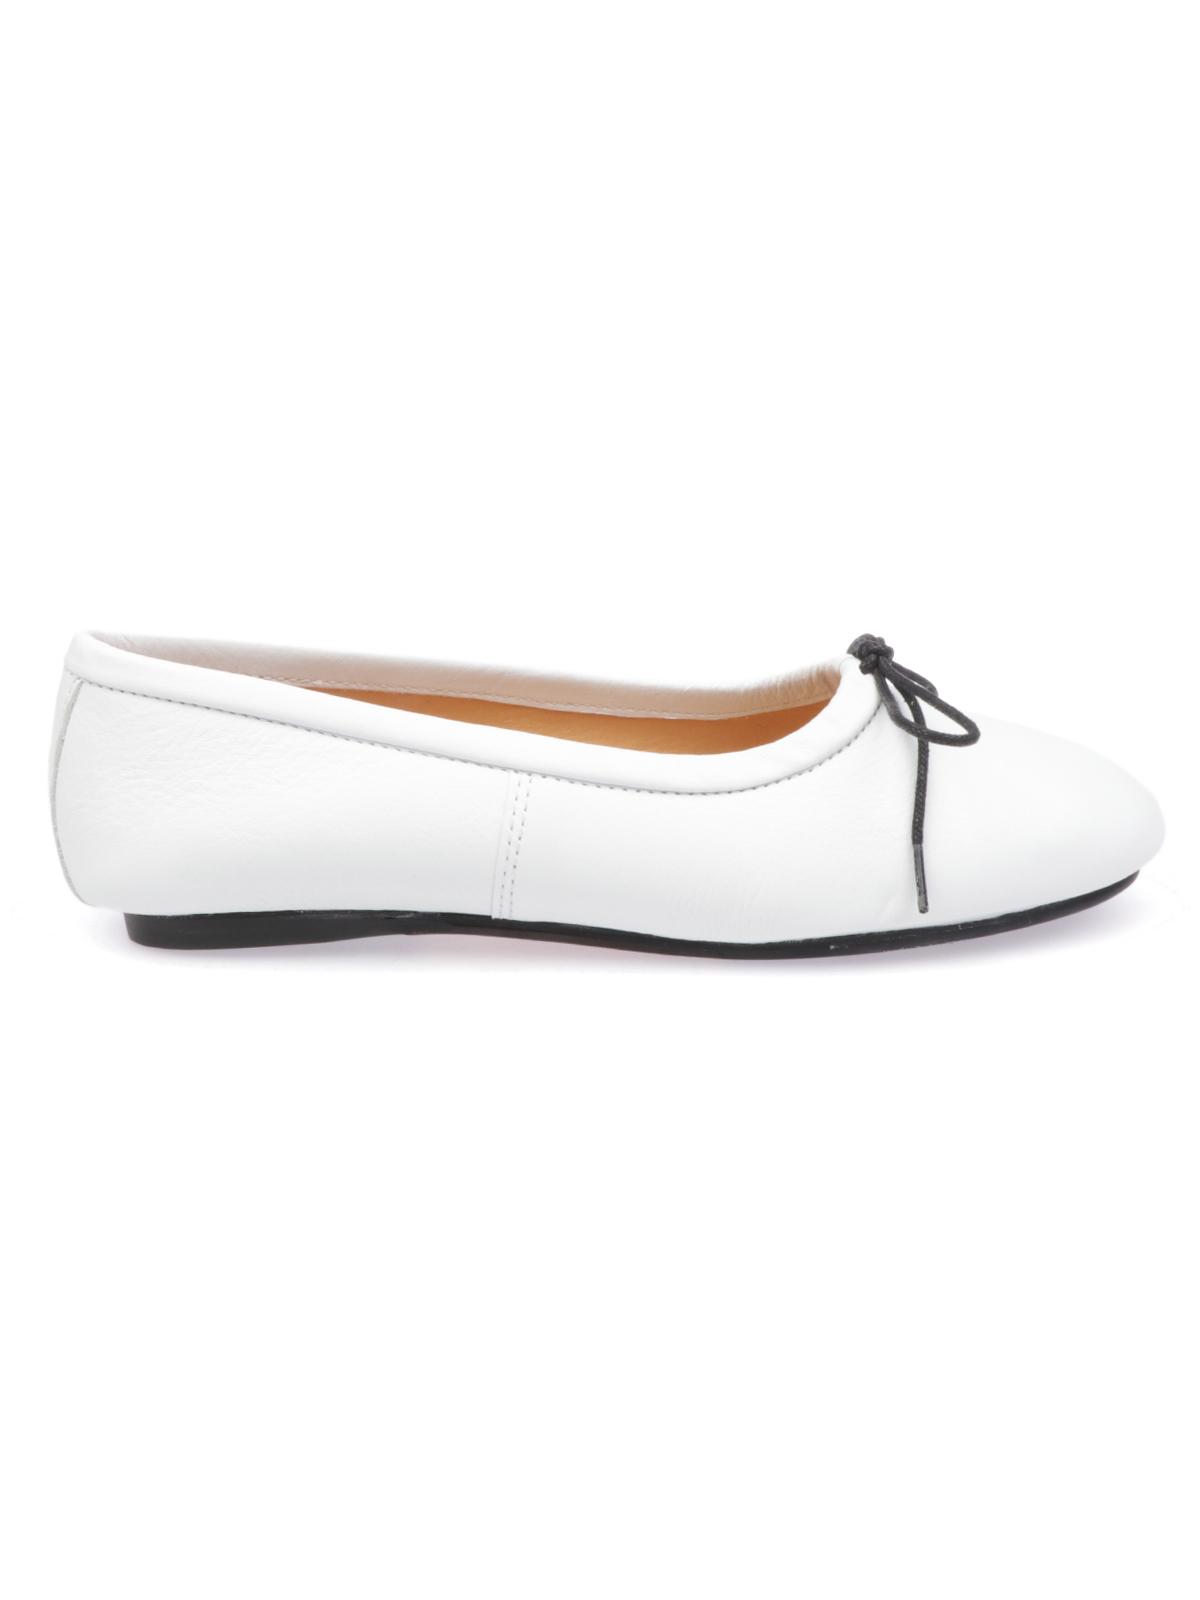 Picture of Virreina   Footwear Paloma